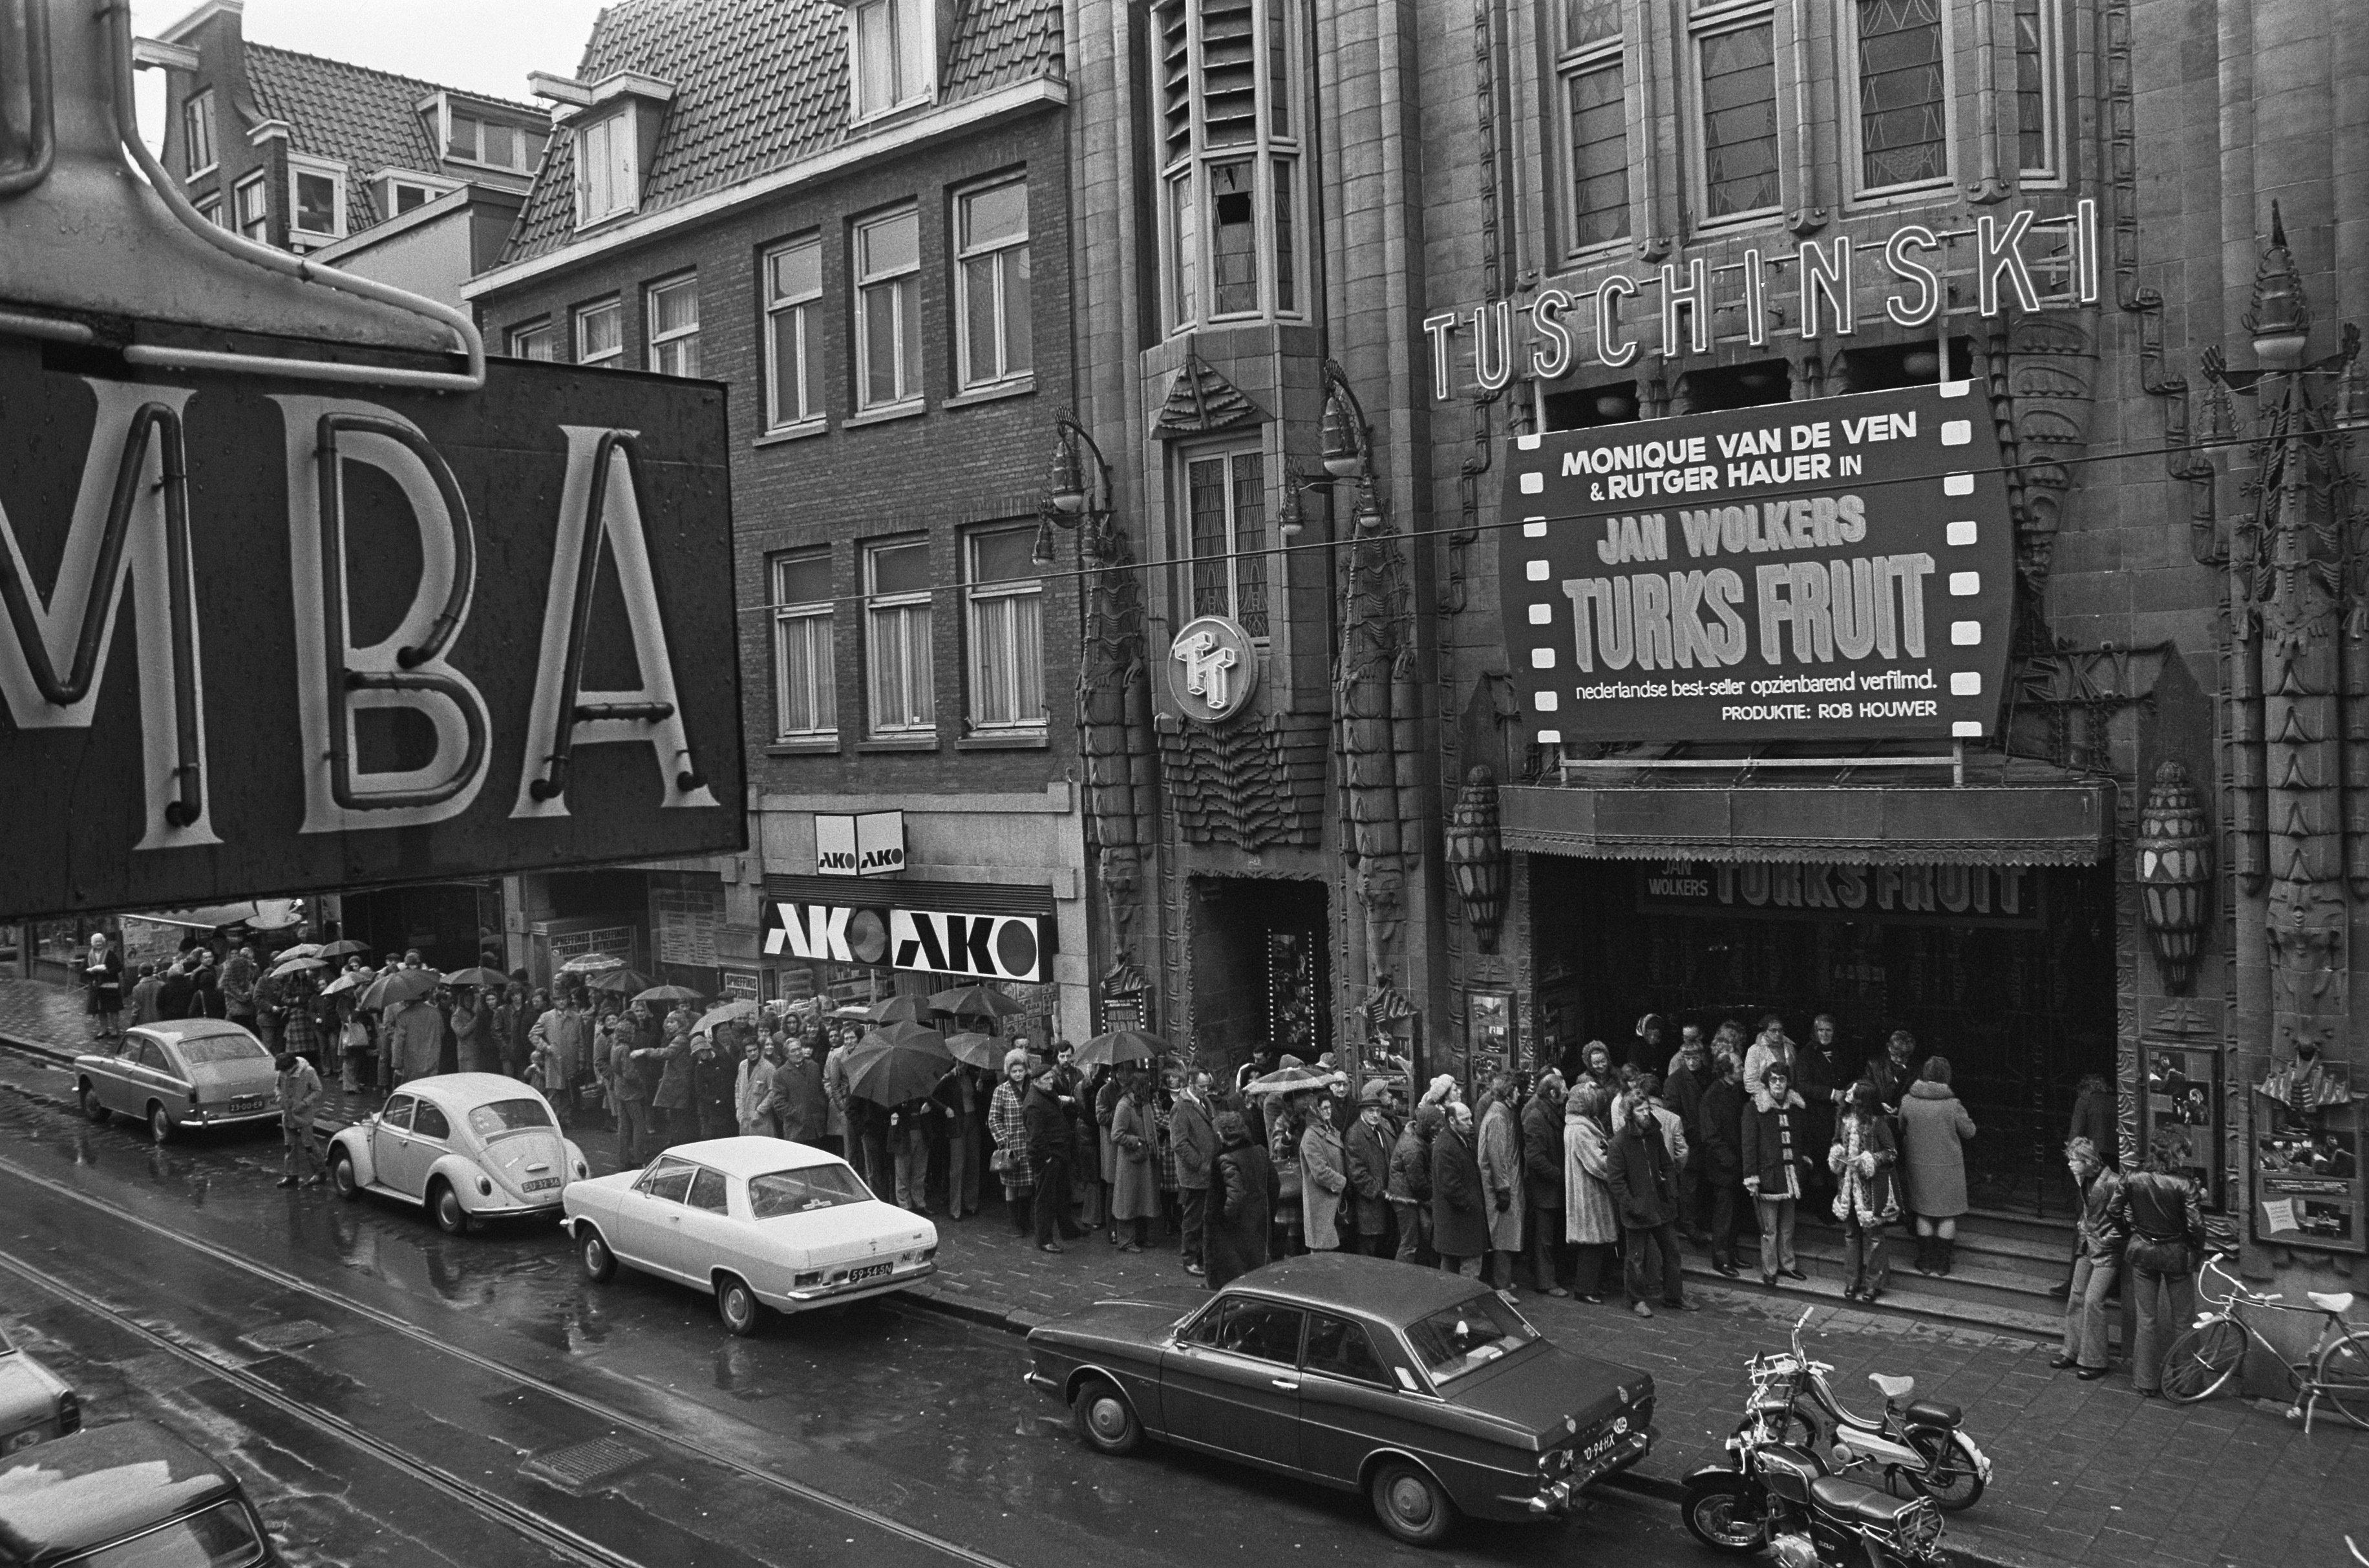 File:Drukte bij Tuschinski, Amsterdam bij film Turks Fruit, Bestanddeelnr  926-2569